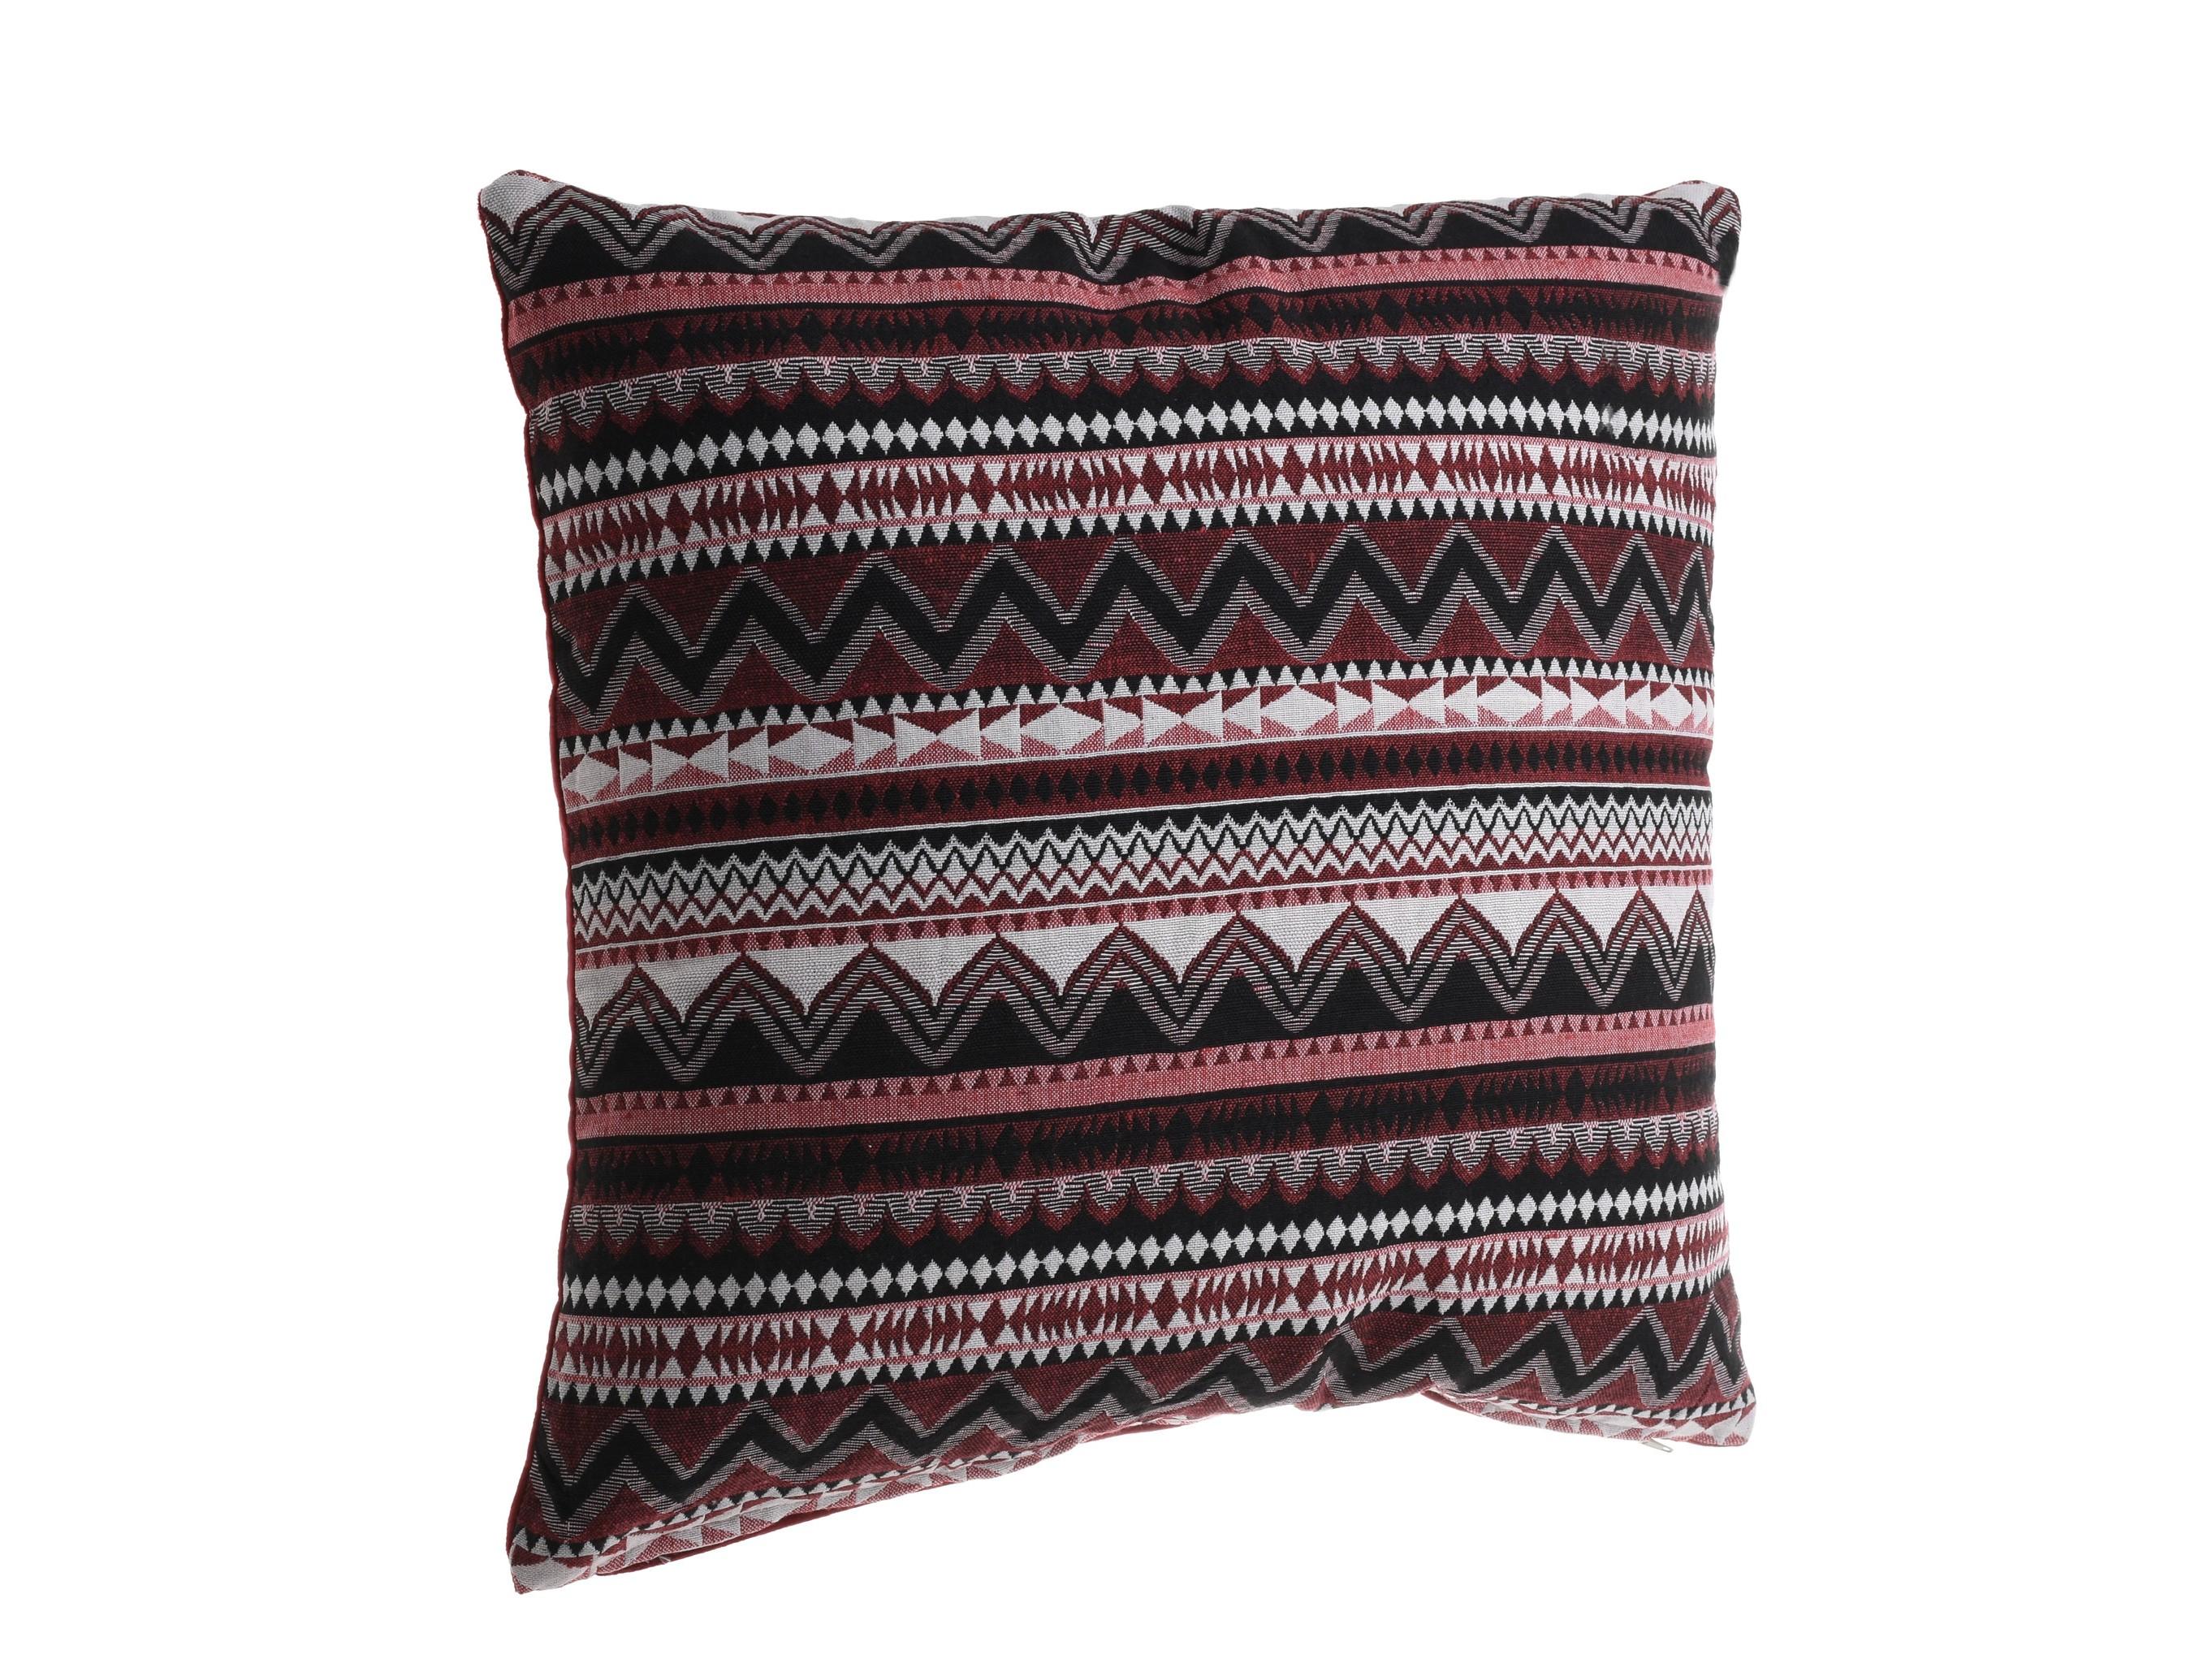 Подушка  NoraКвадратные подушки и наволочки<br><br><br>Material: Текстиль<br>Ширина см: 43<br>Высота см: 43<br>Глубина см: 5